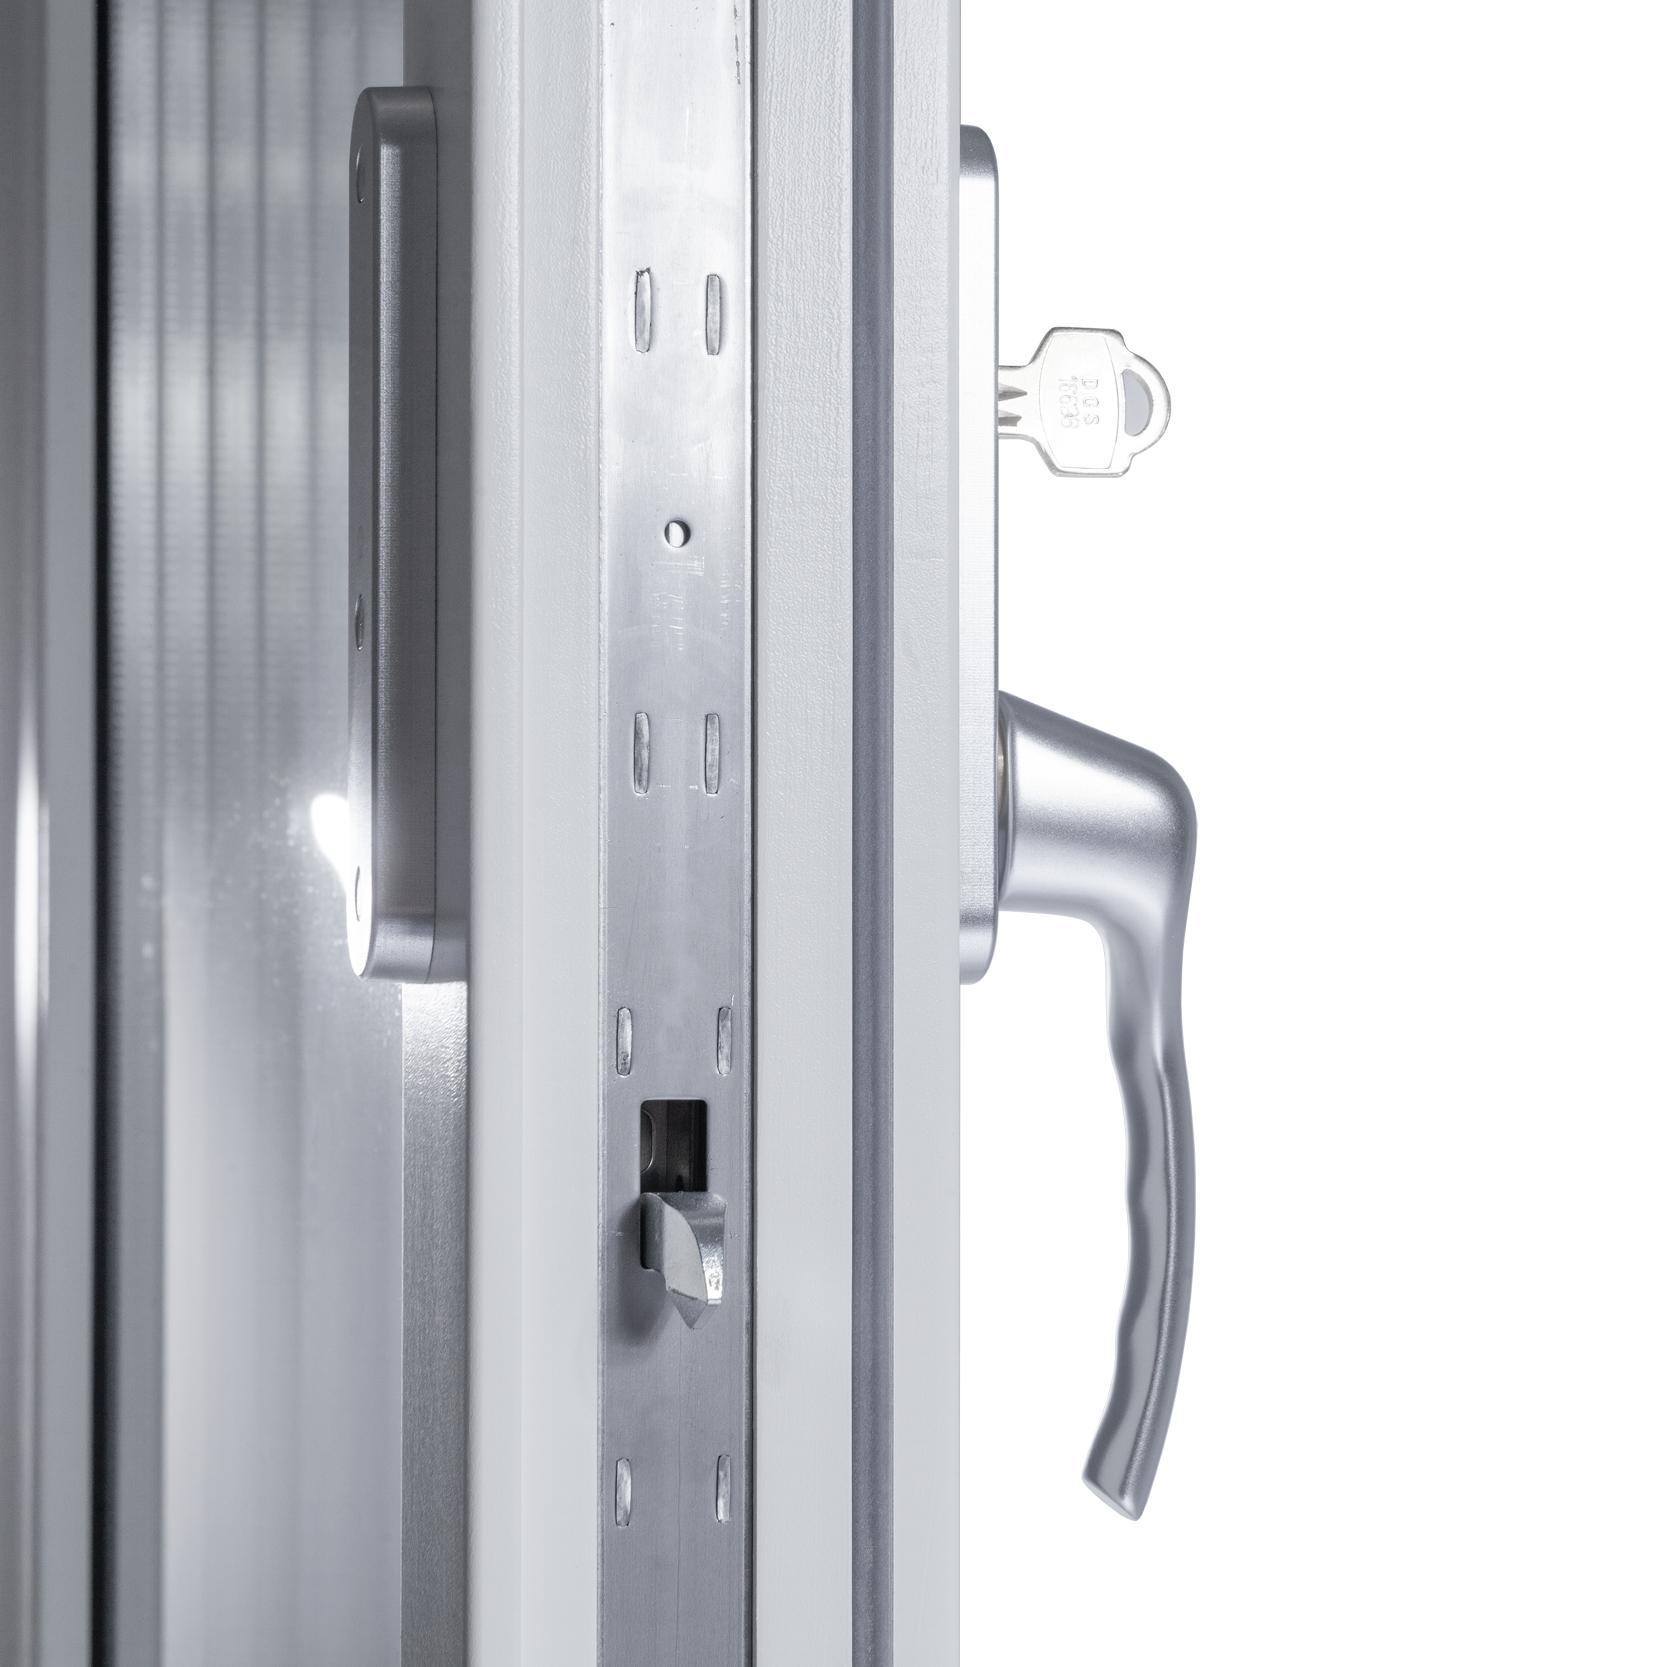 Enkel Altan/Balkongdörr 2 Glas – Trä/Alu – Flex Fönster